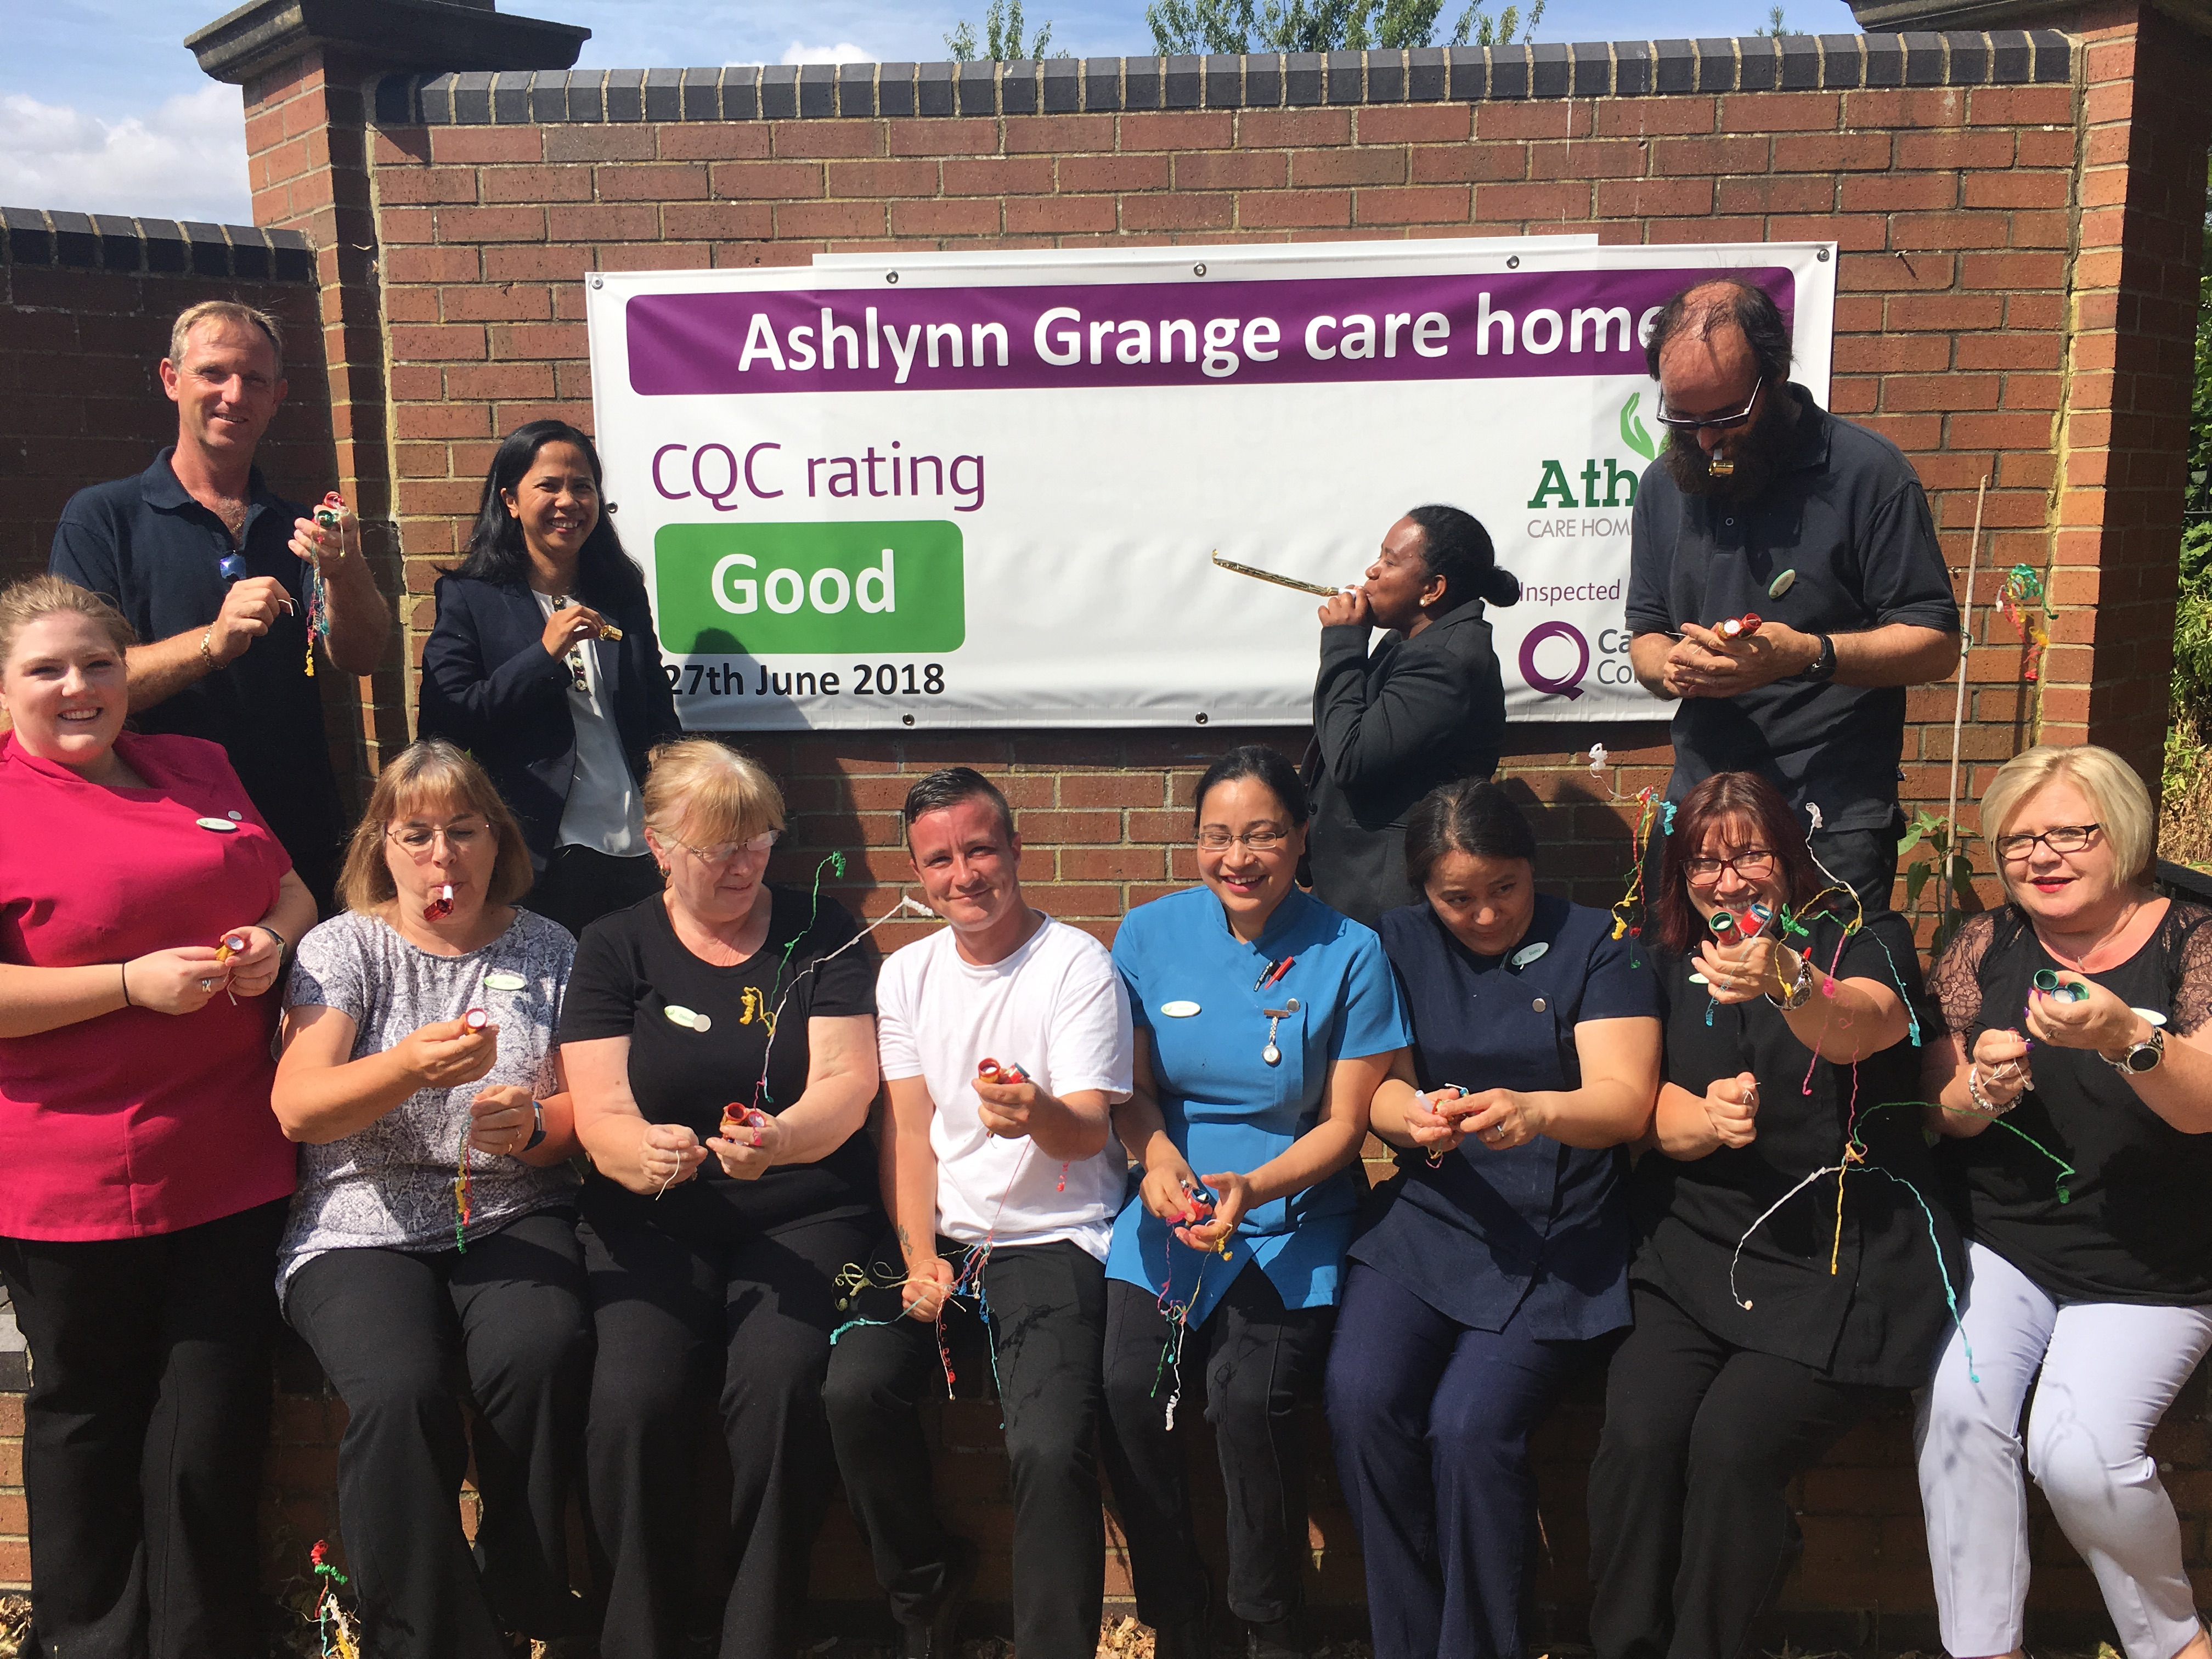 CQC Banners for Ashlynn Grange